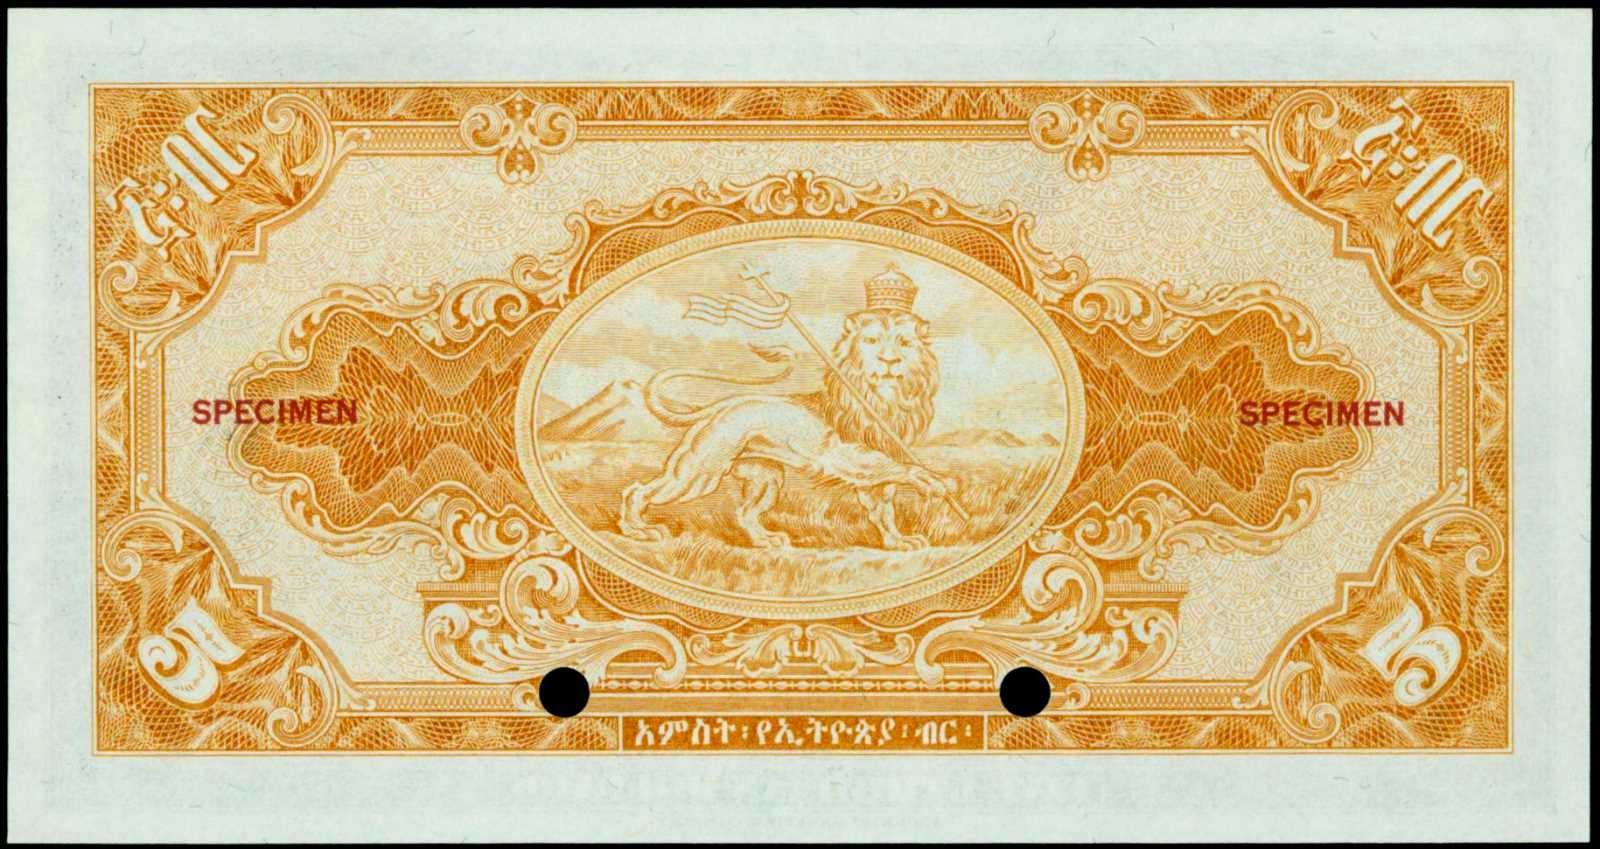 Ethiopia paper money 5 Dollars banknote 1945